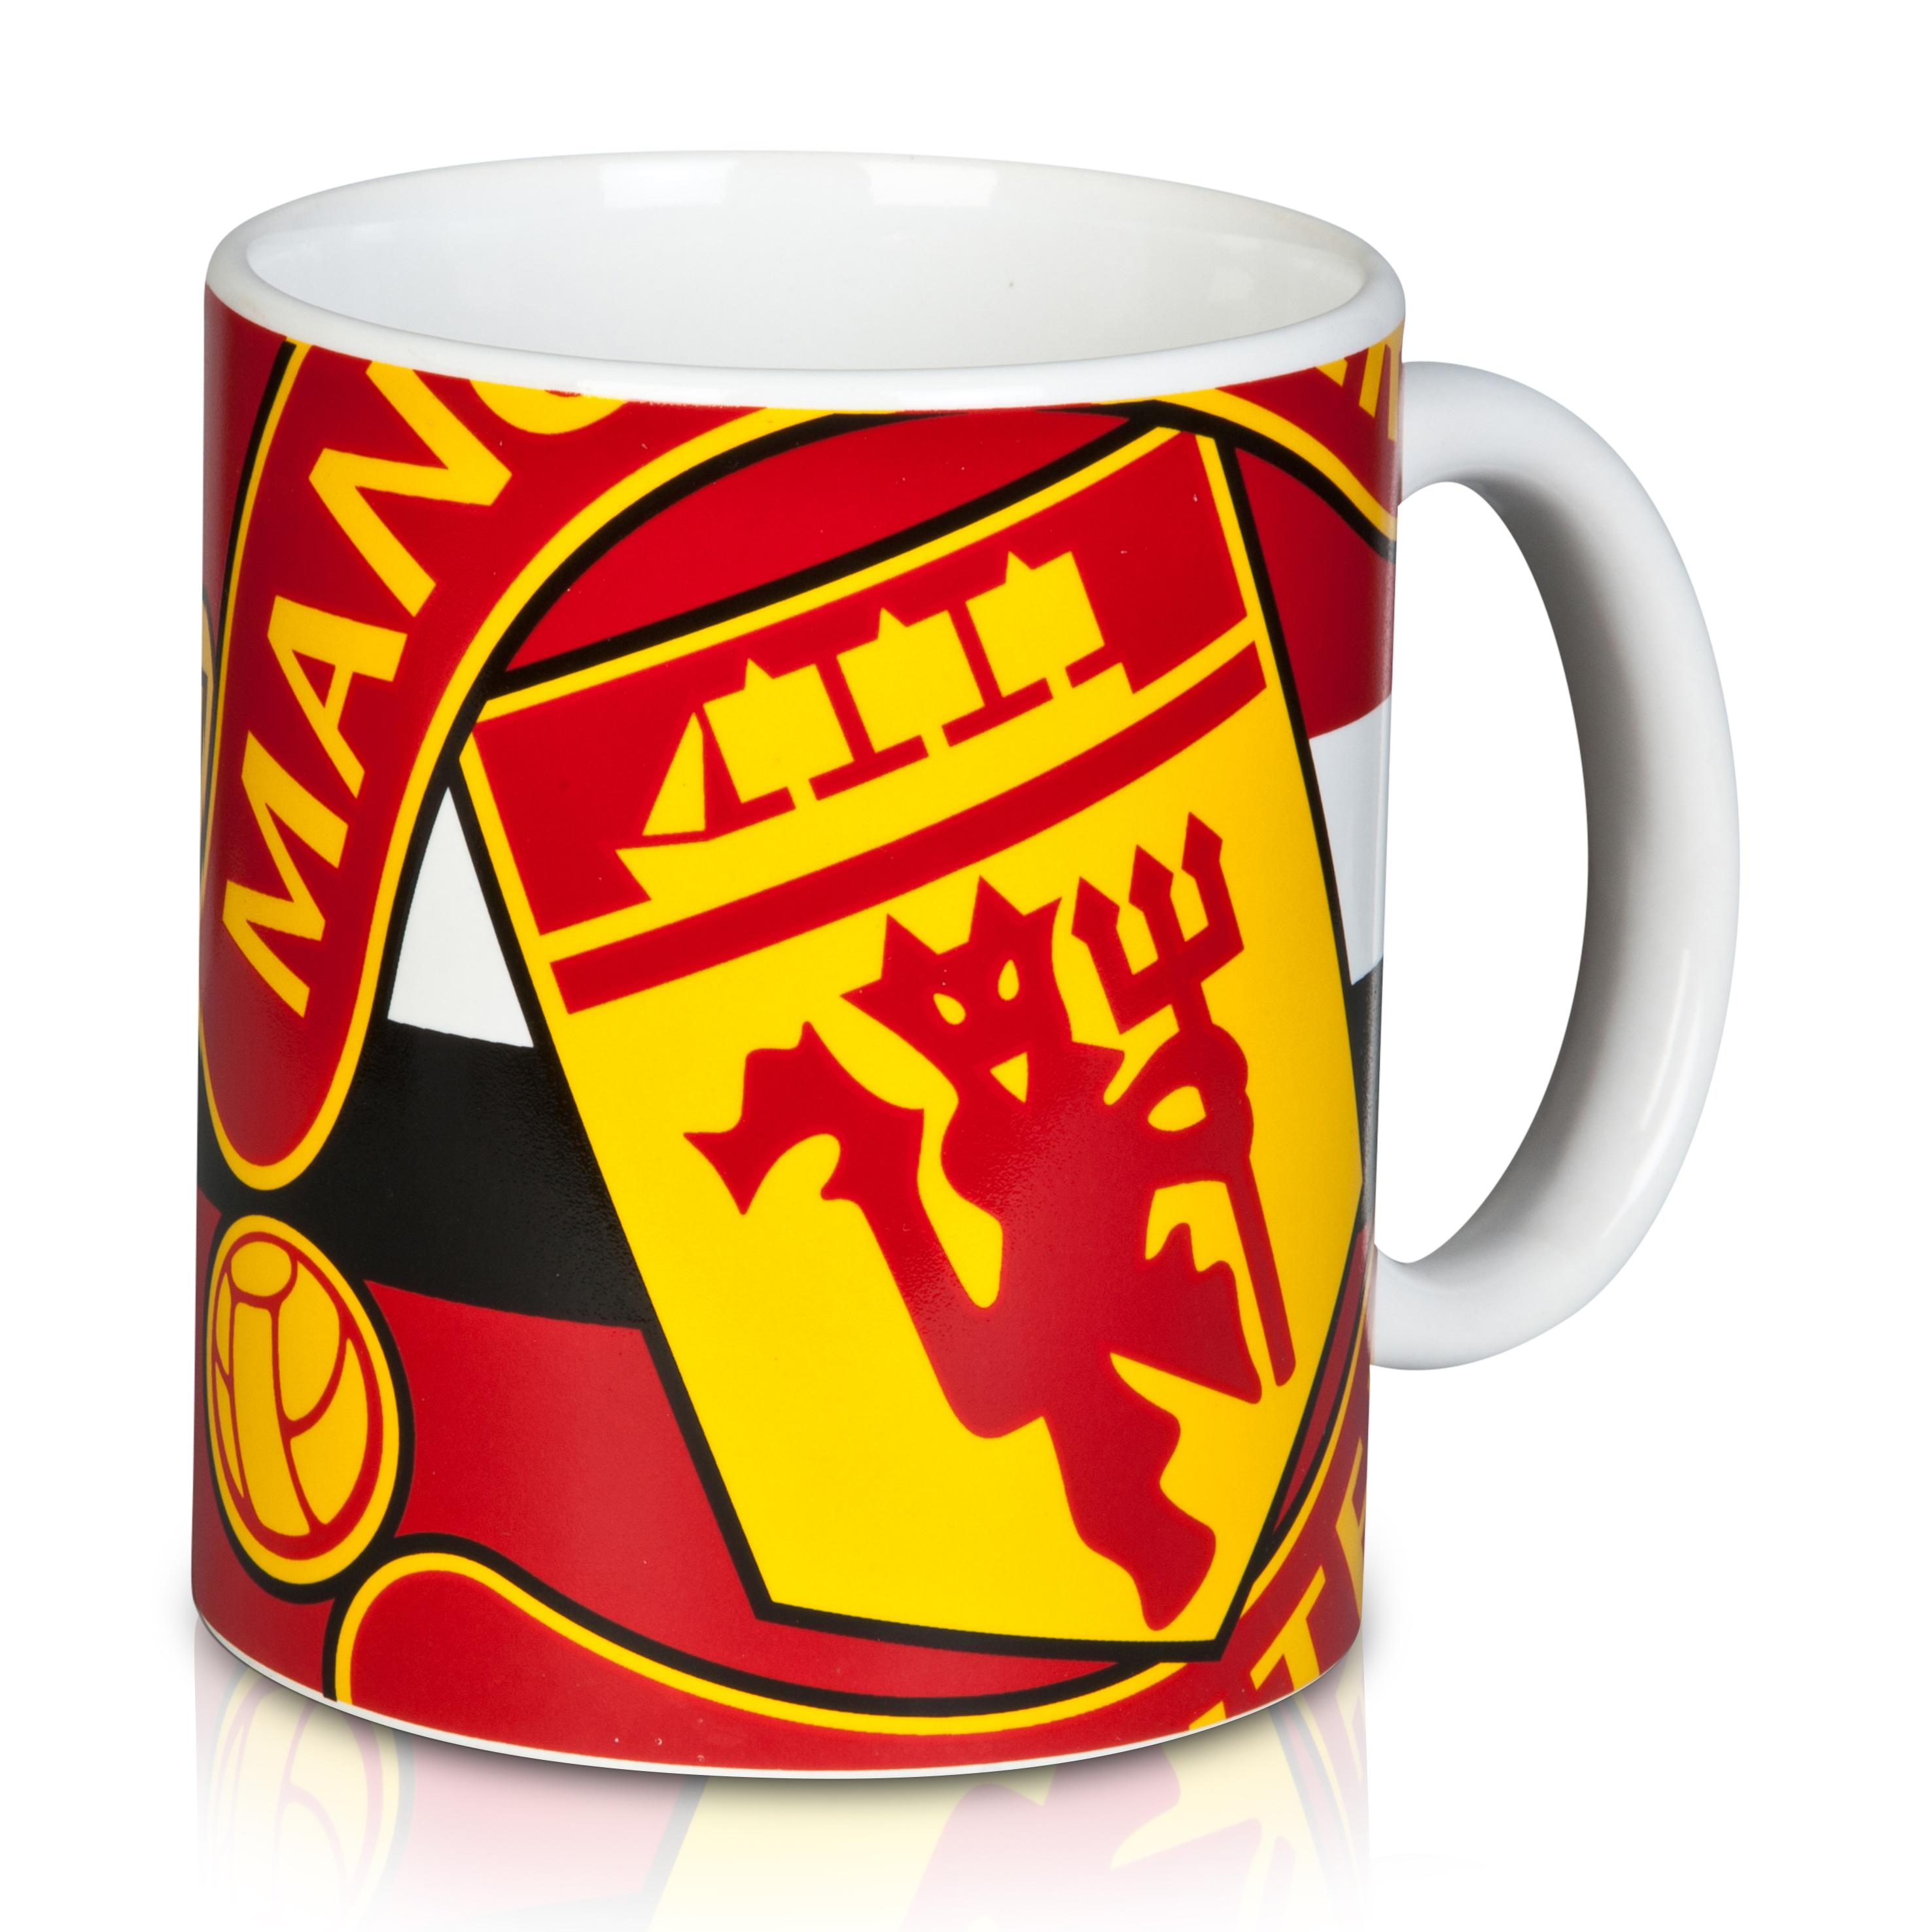 Manchester United Big Crest Mug